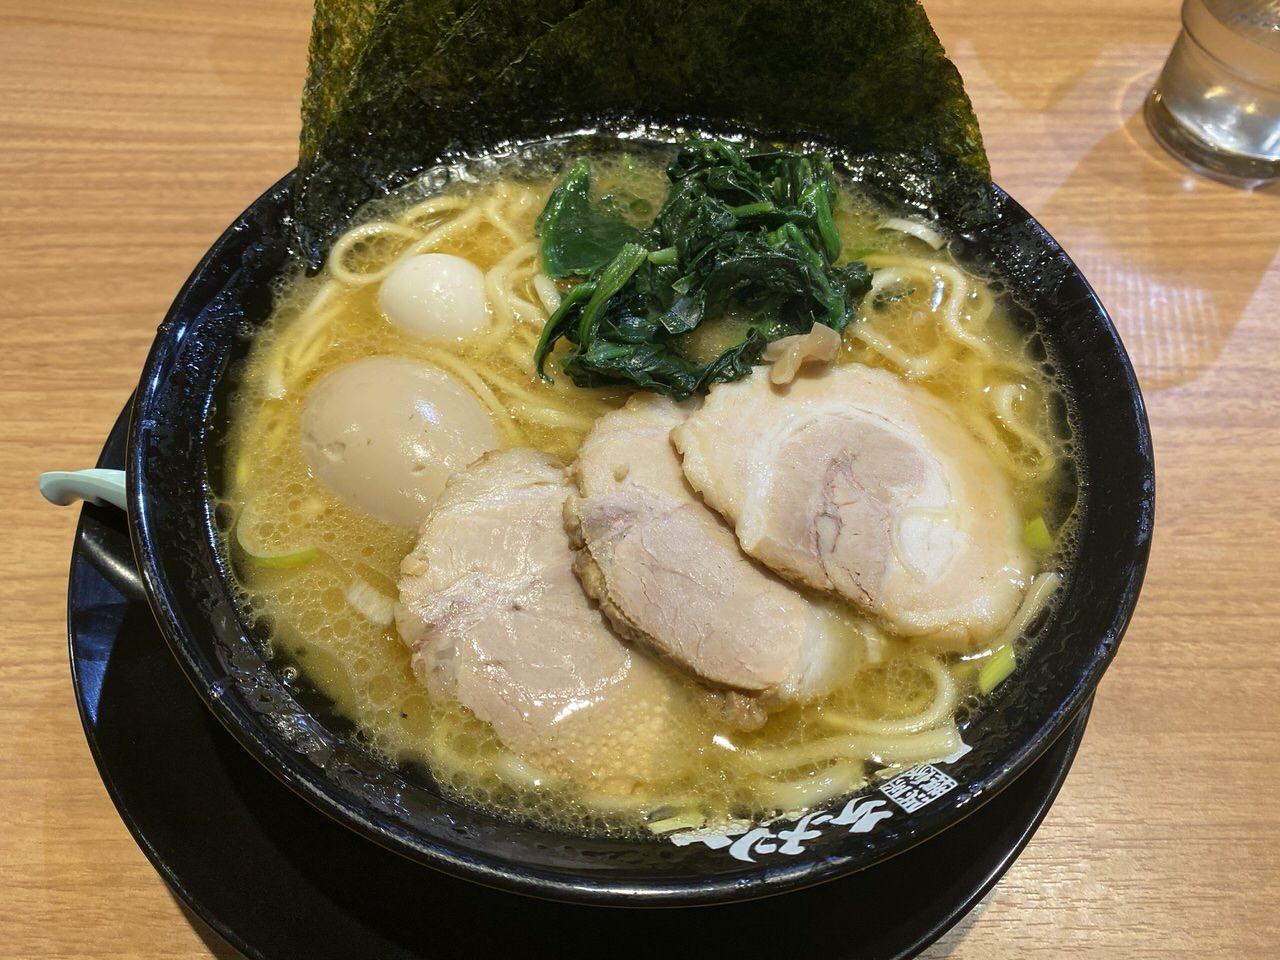 「横浜家系ラーメン 町田商店」(浦和)6